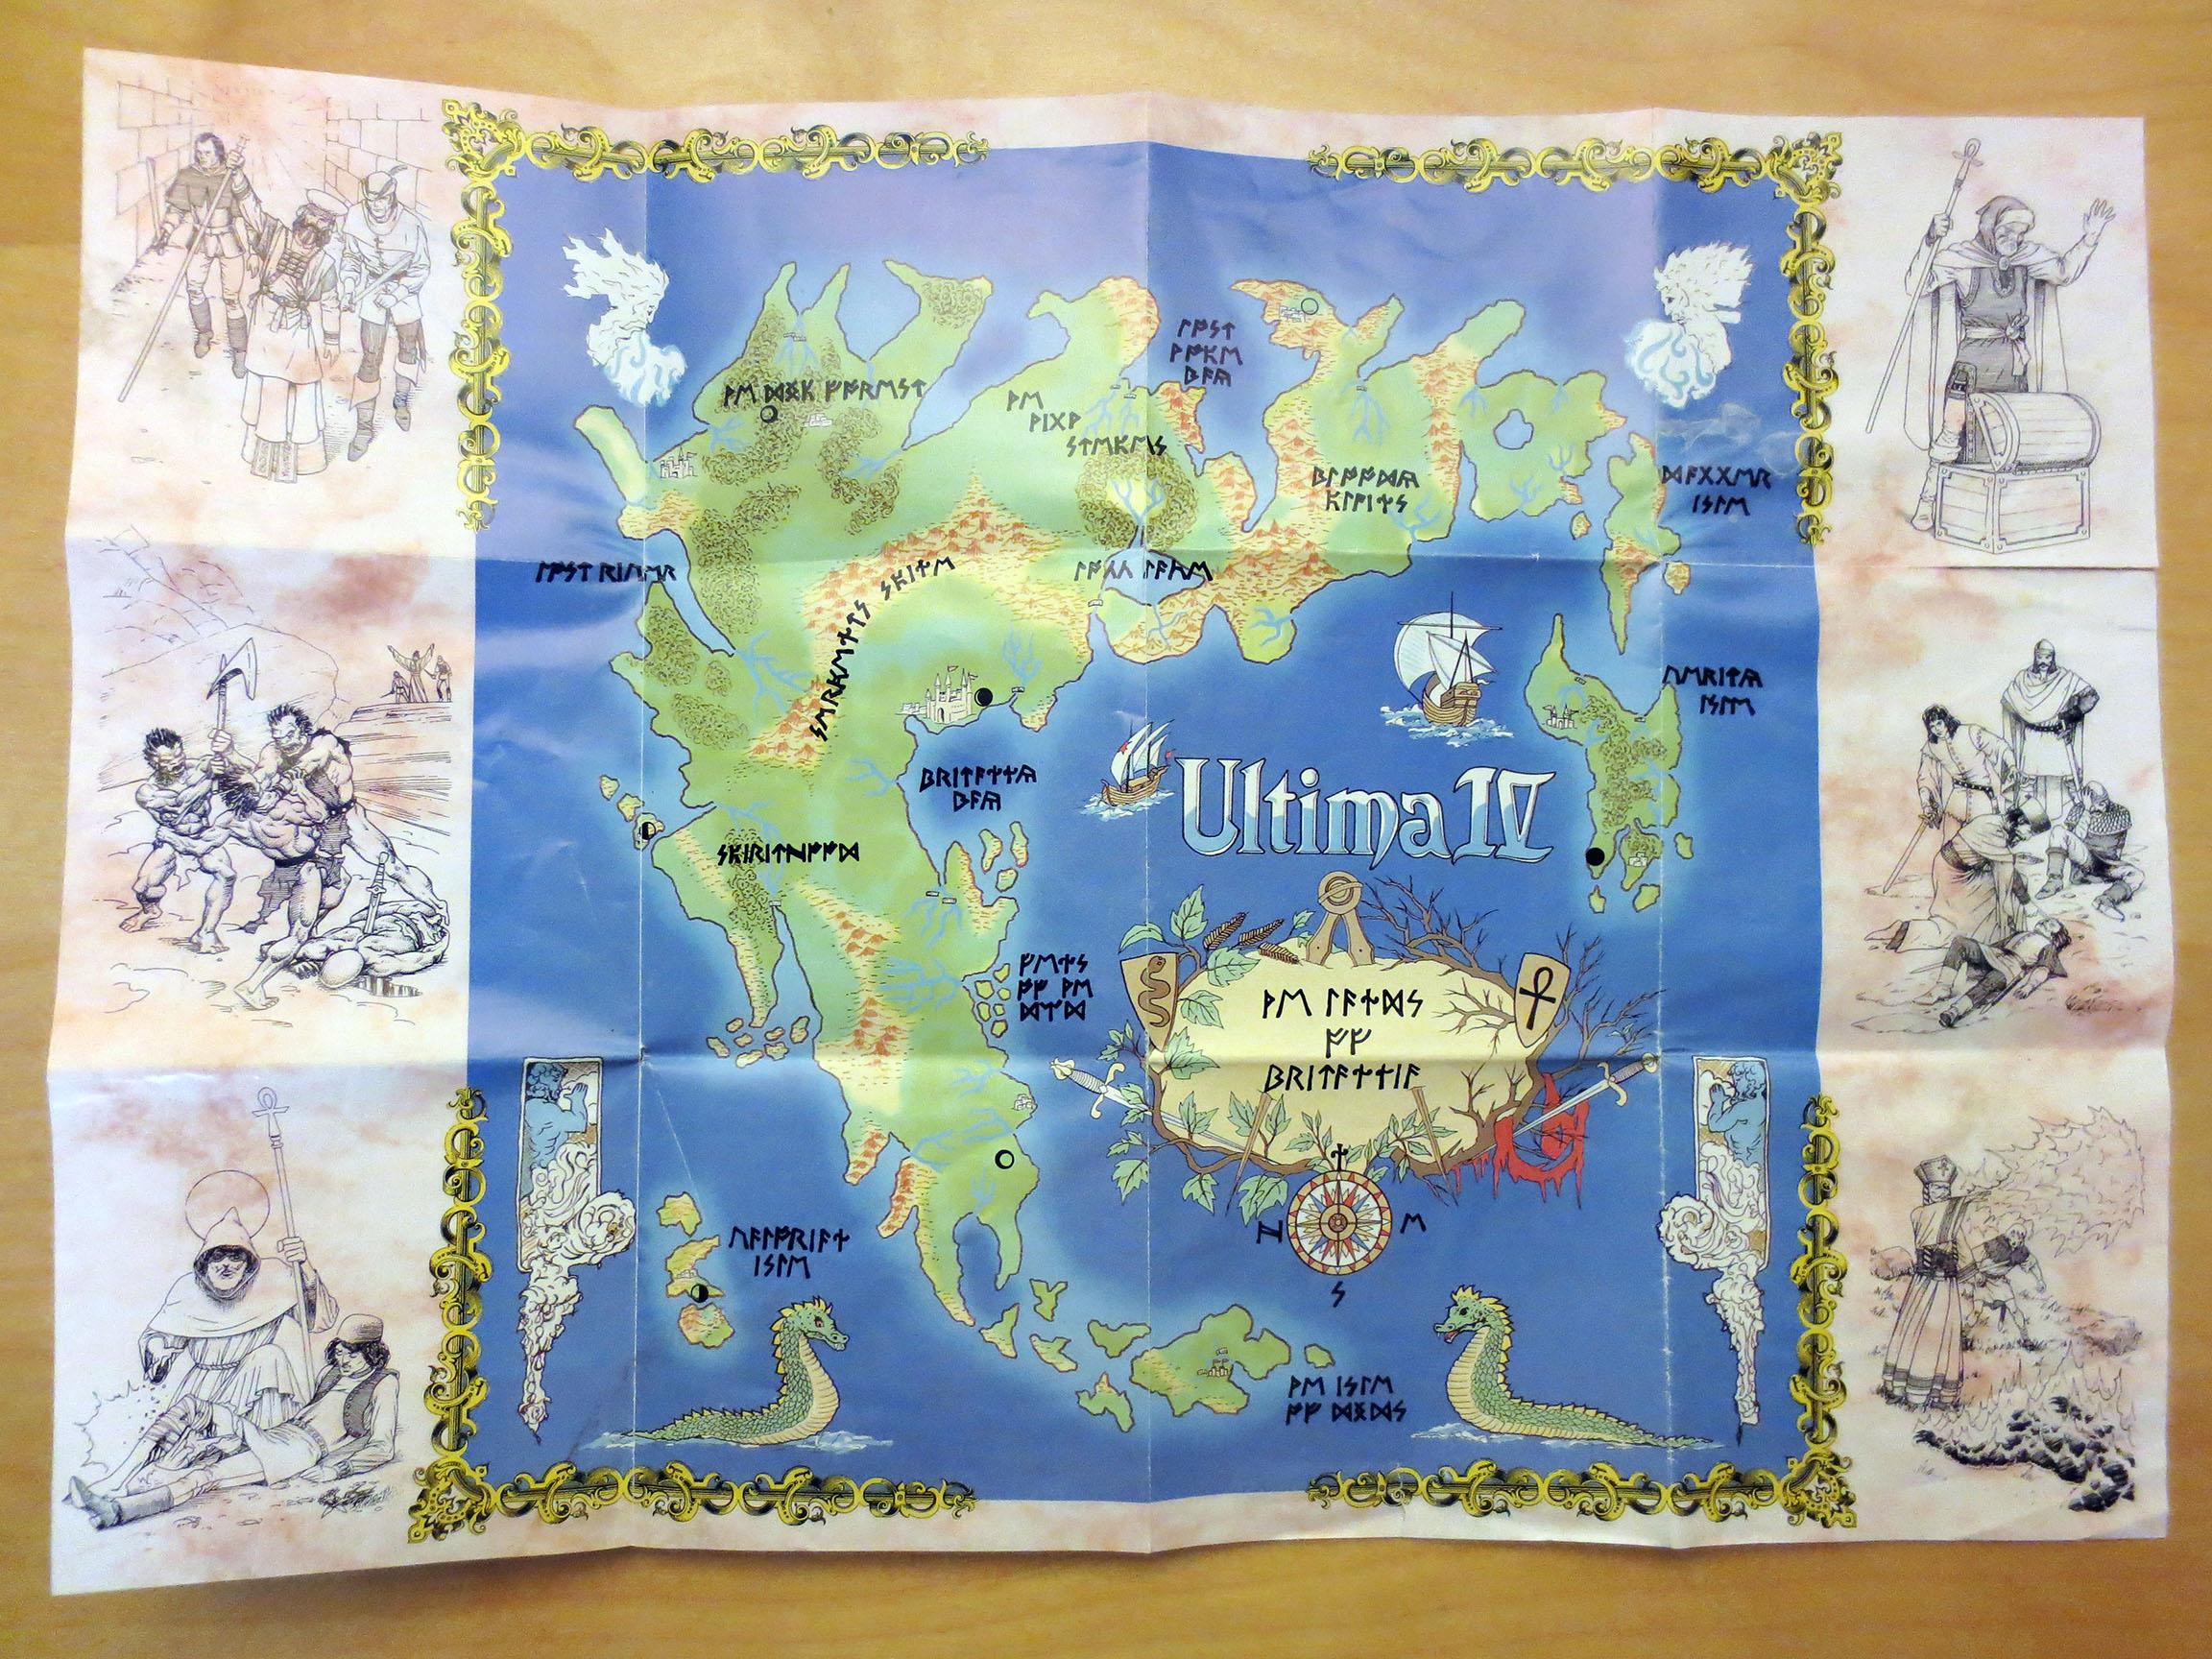 Sega Master System Ultima Iv 02 Retro Megabit